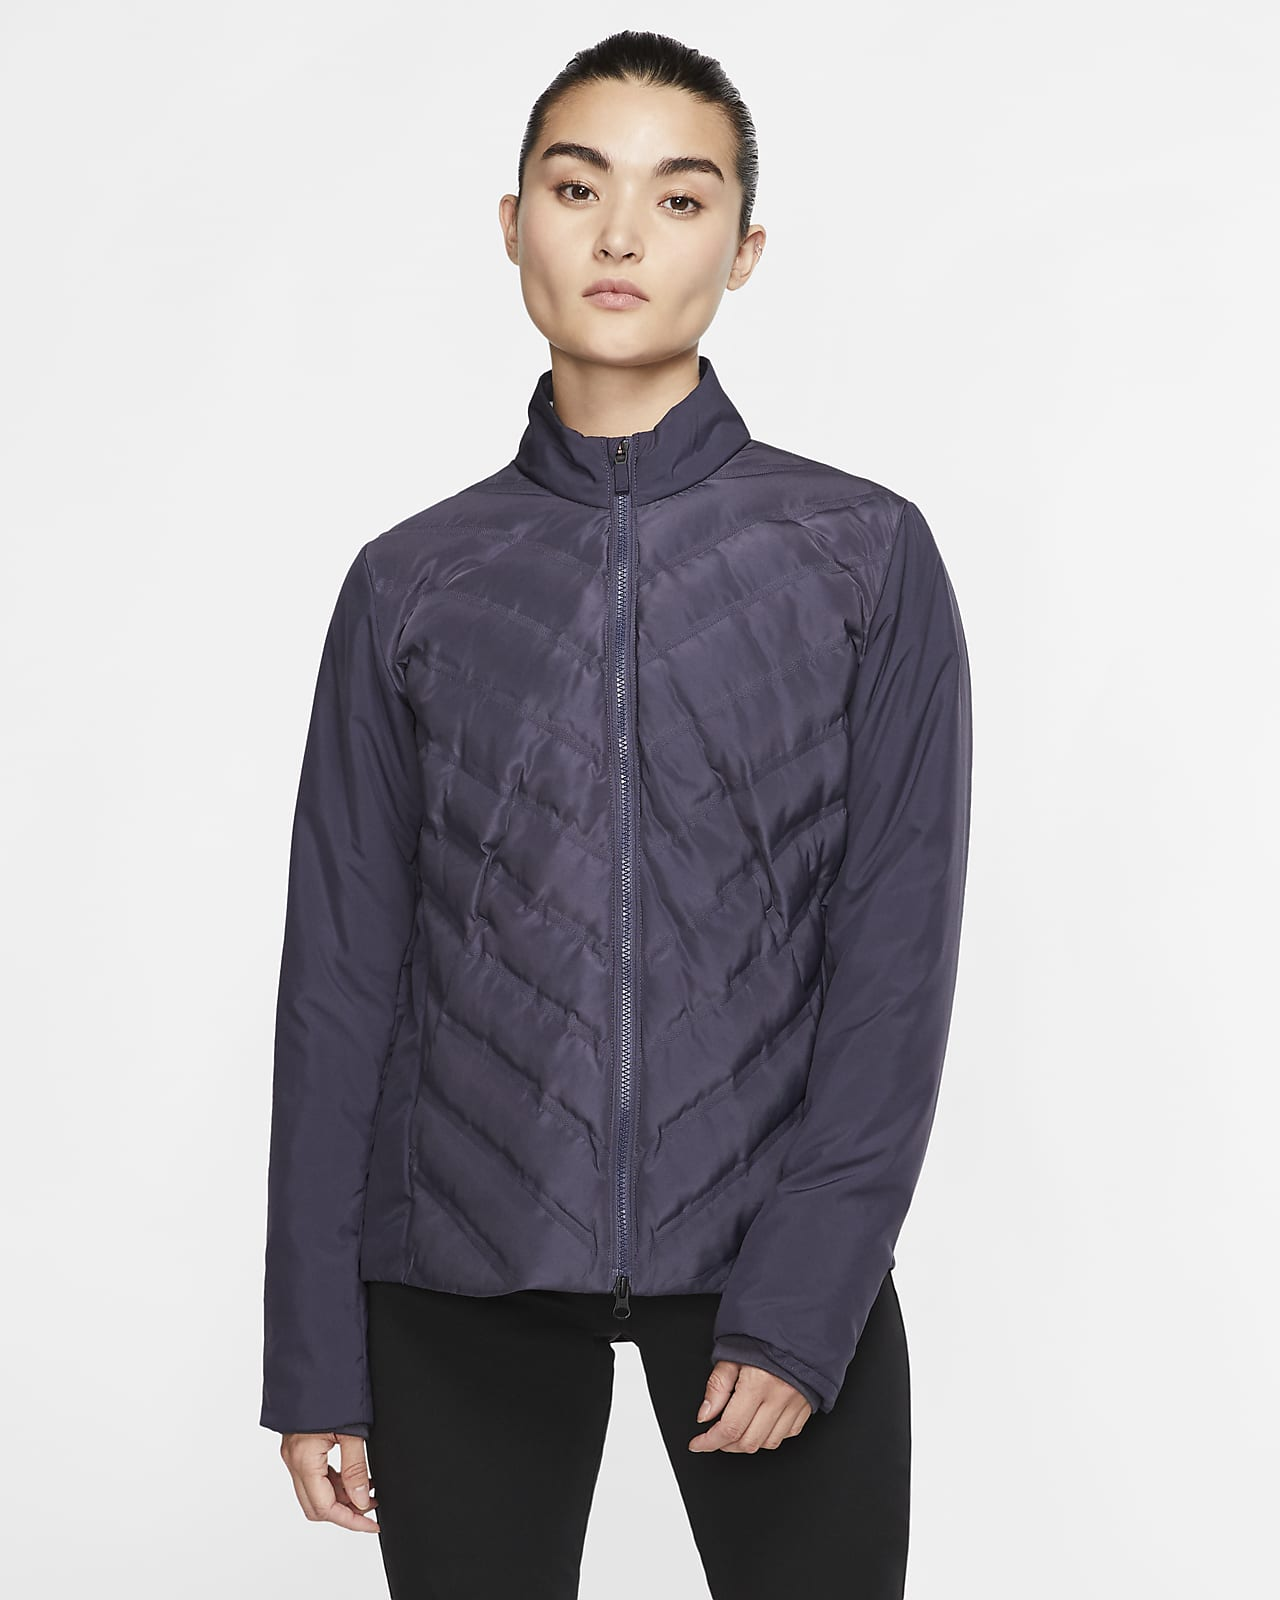 Nike AeroLoft Repel Women's Golf Jacket